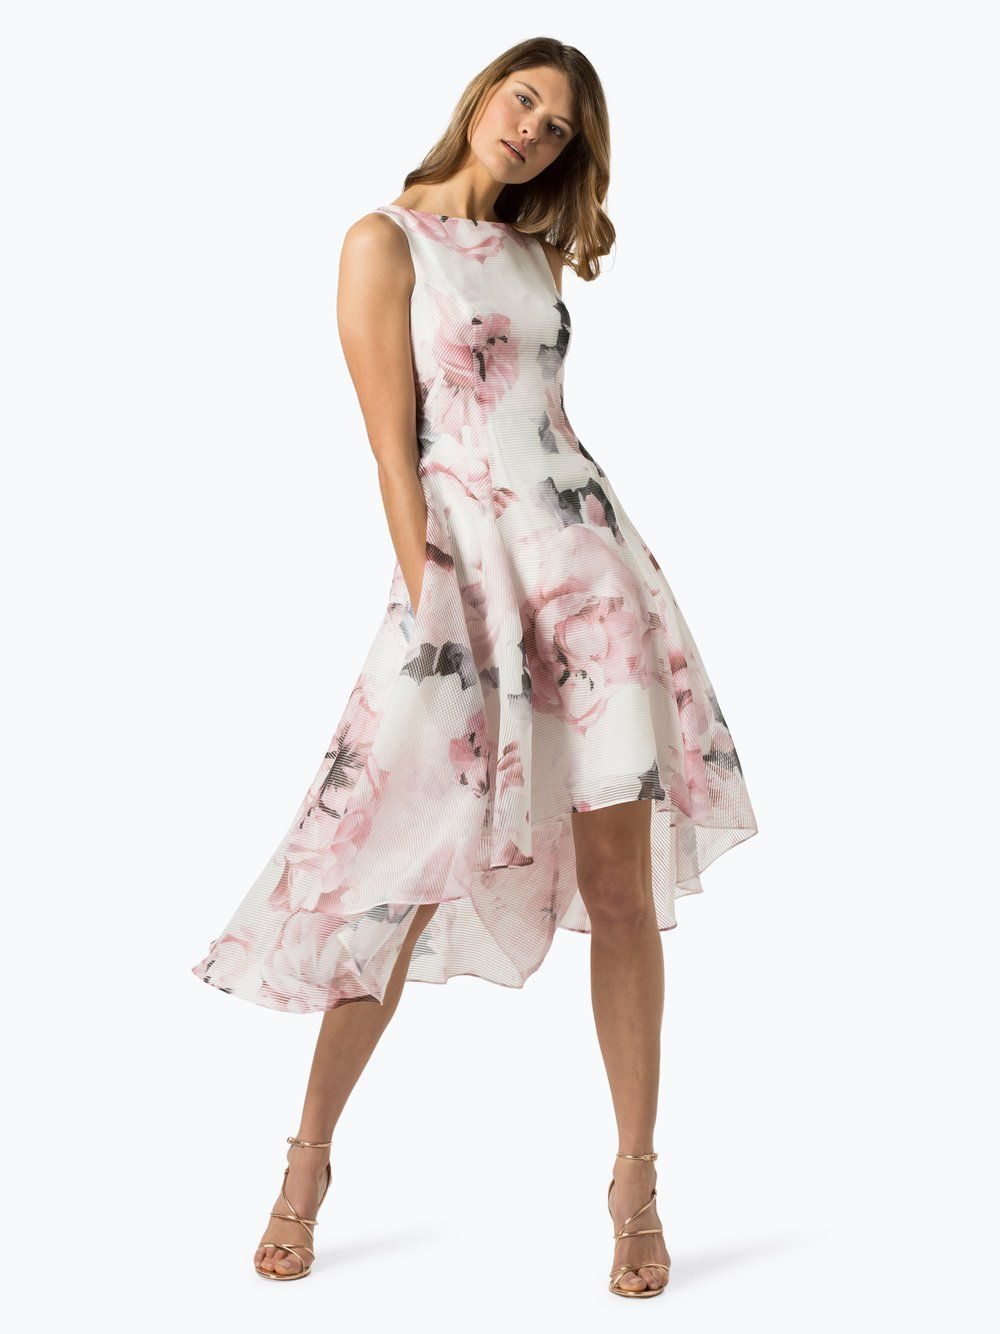 Coast Abendkleid - Rosita rosa  Abendkleid, Kleider, Modestil